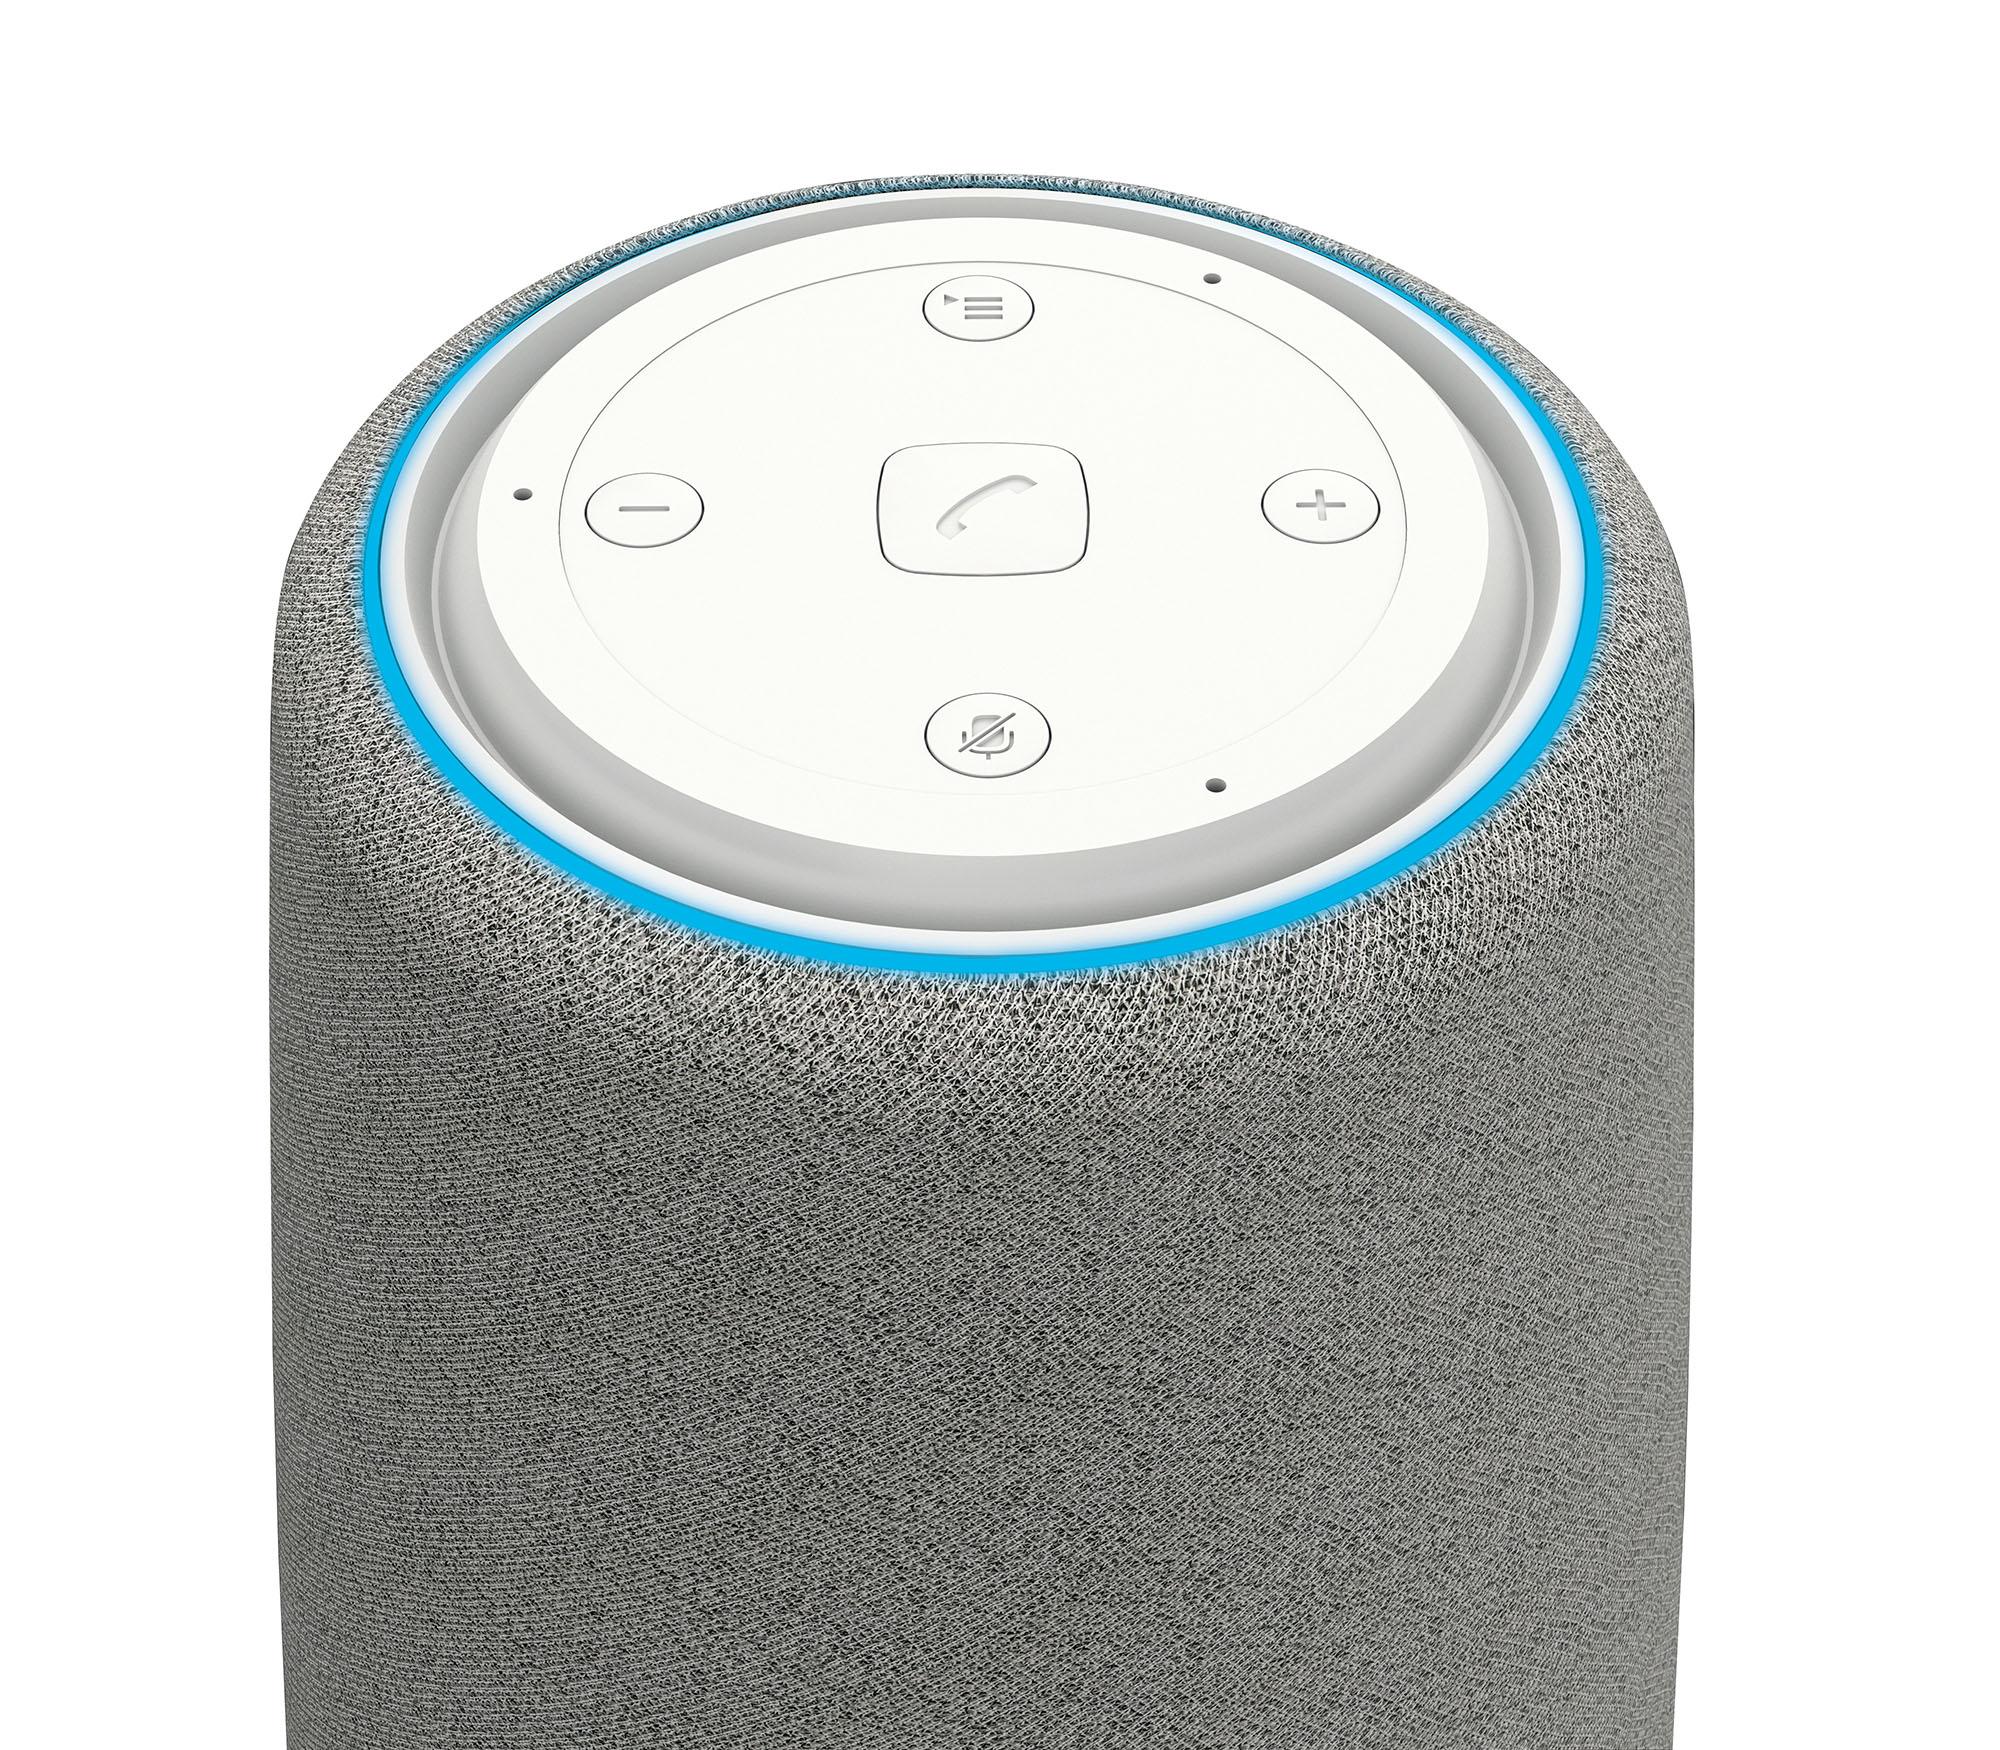 Gigaset Smart Speaker L800HX Tasten